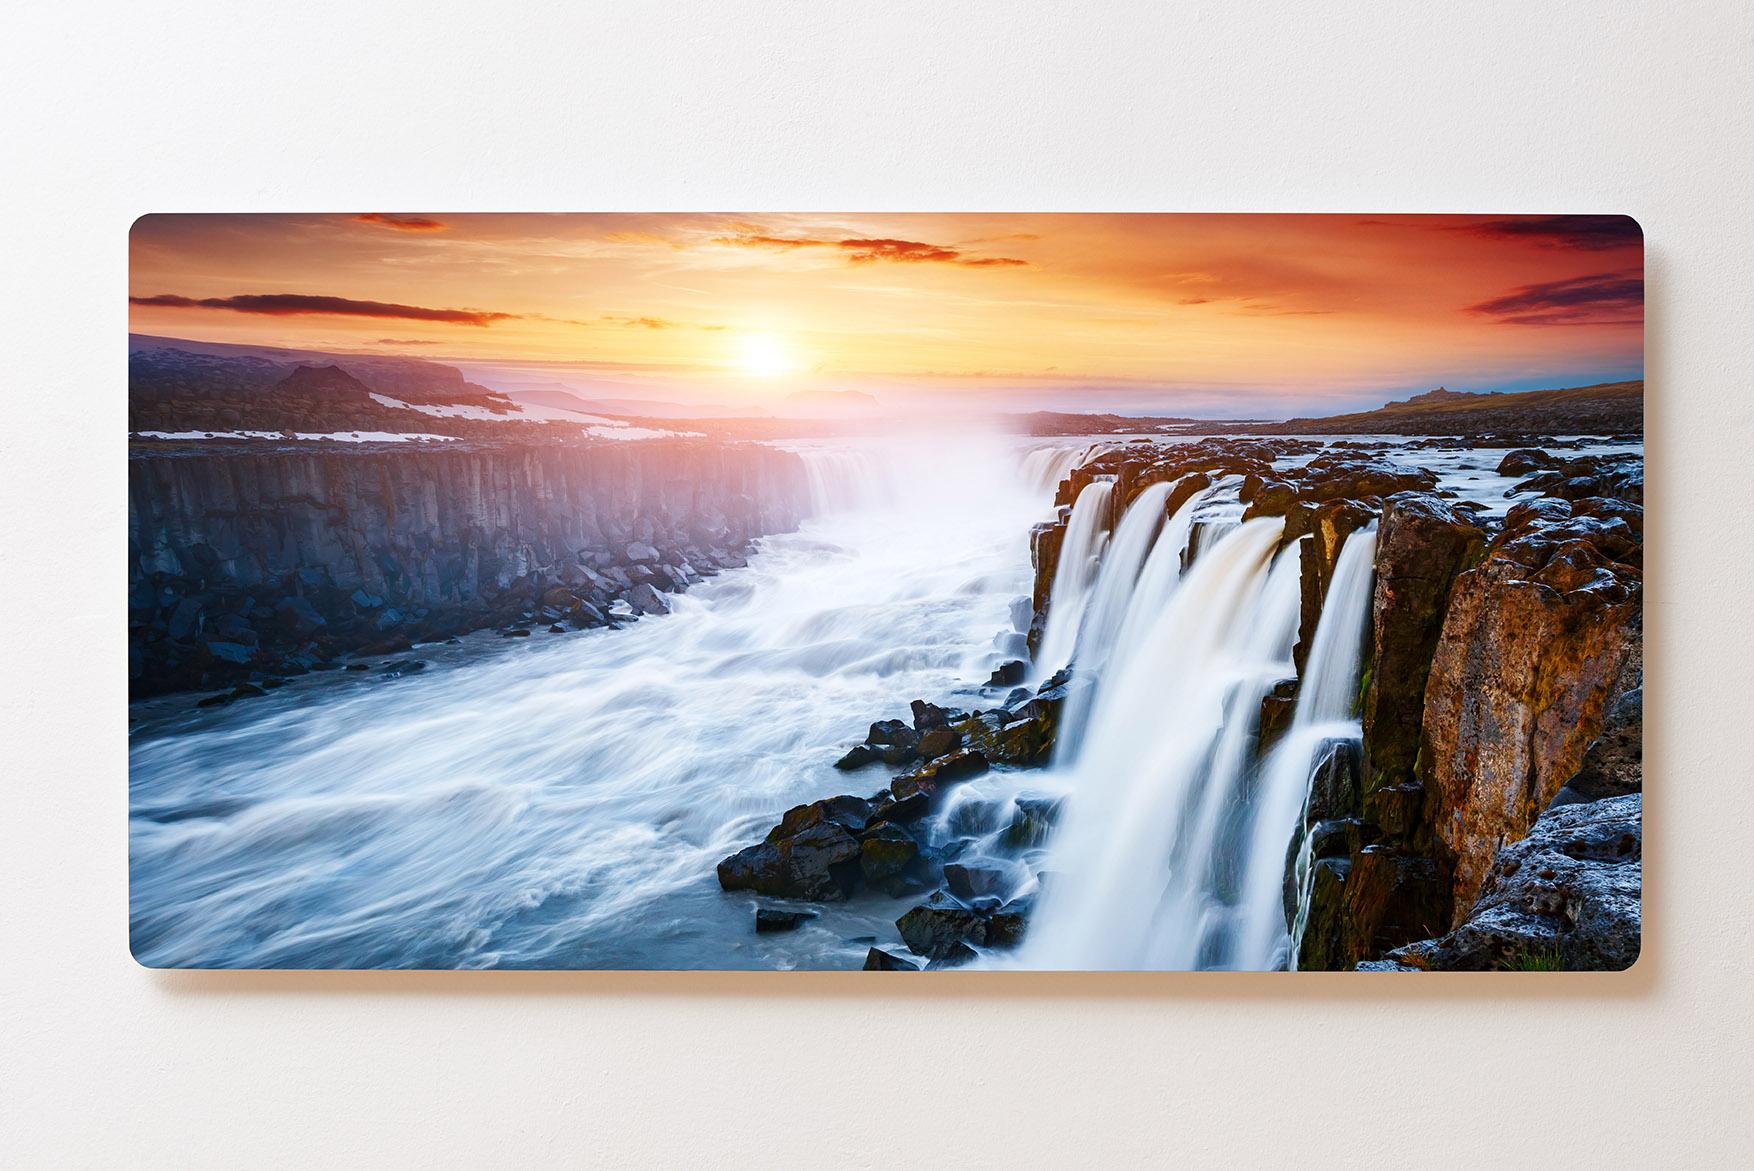 Magnettafel BACKLIGHT 120x60cm Motiv-Wandbild M148 Wasserfall Sonnenuntergang